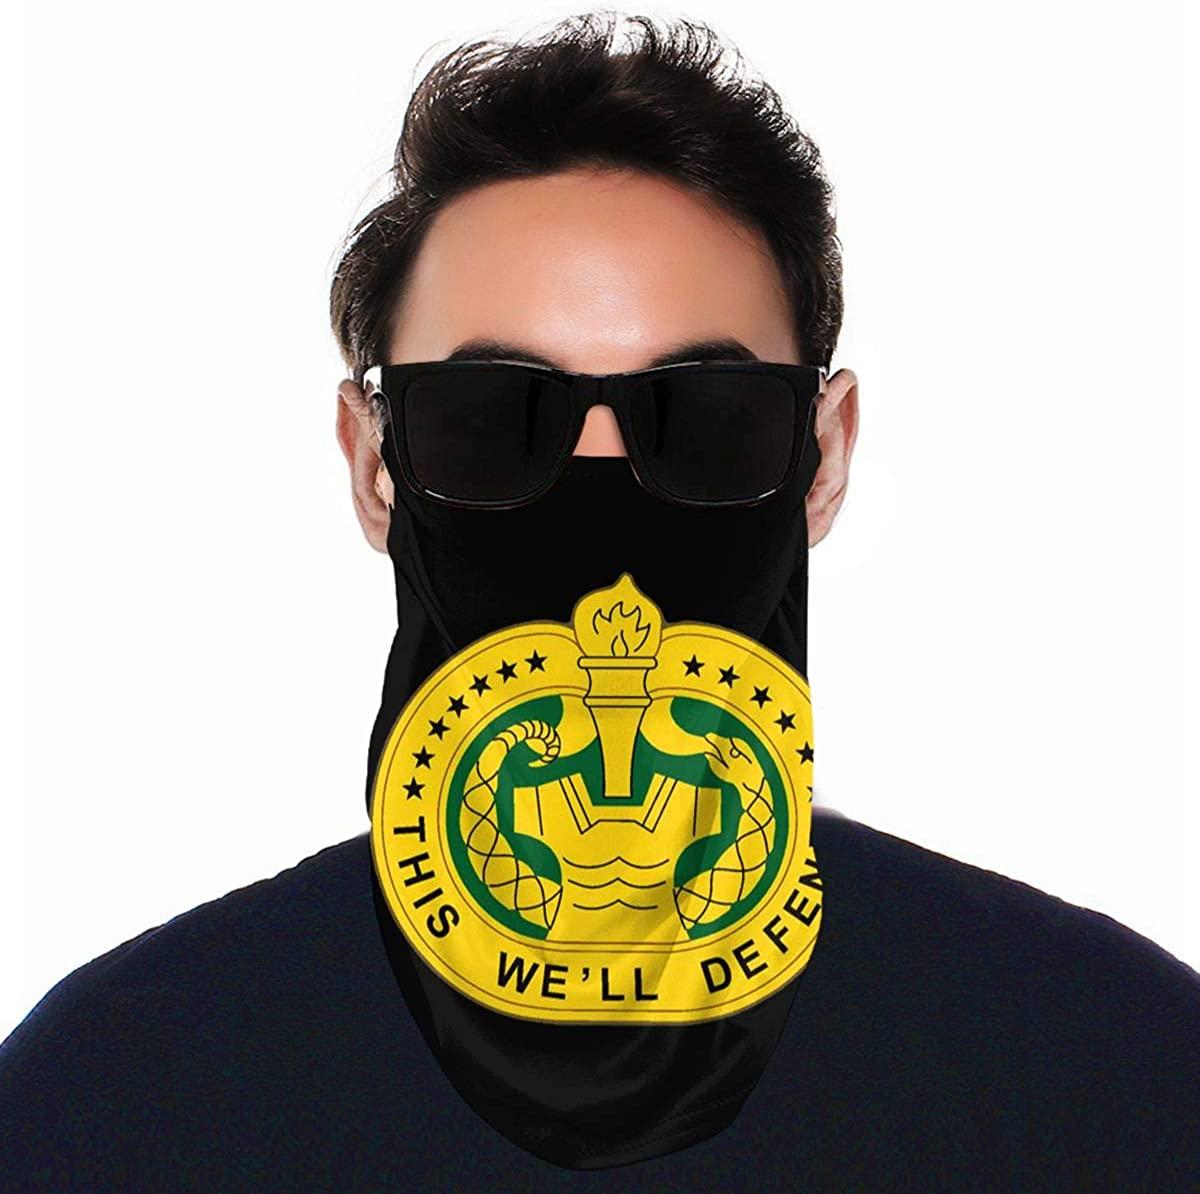 U S Army Drill Sergeant Logo Face Shield Neck Gaiter Face Protective Scarf Balaclavas Unisex